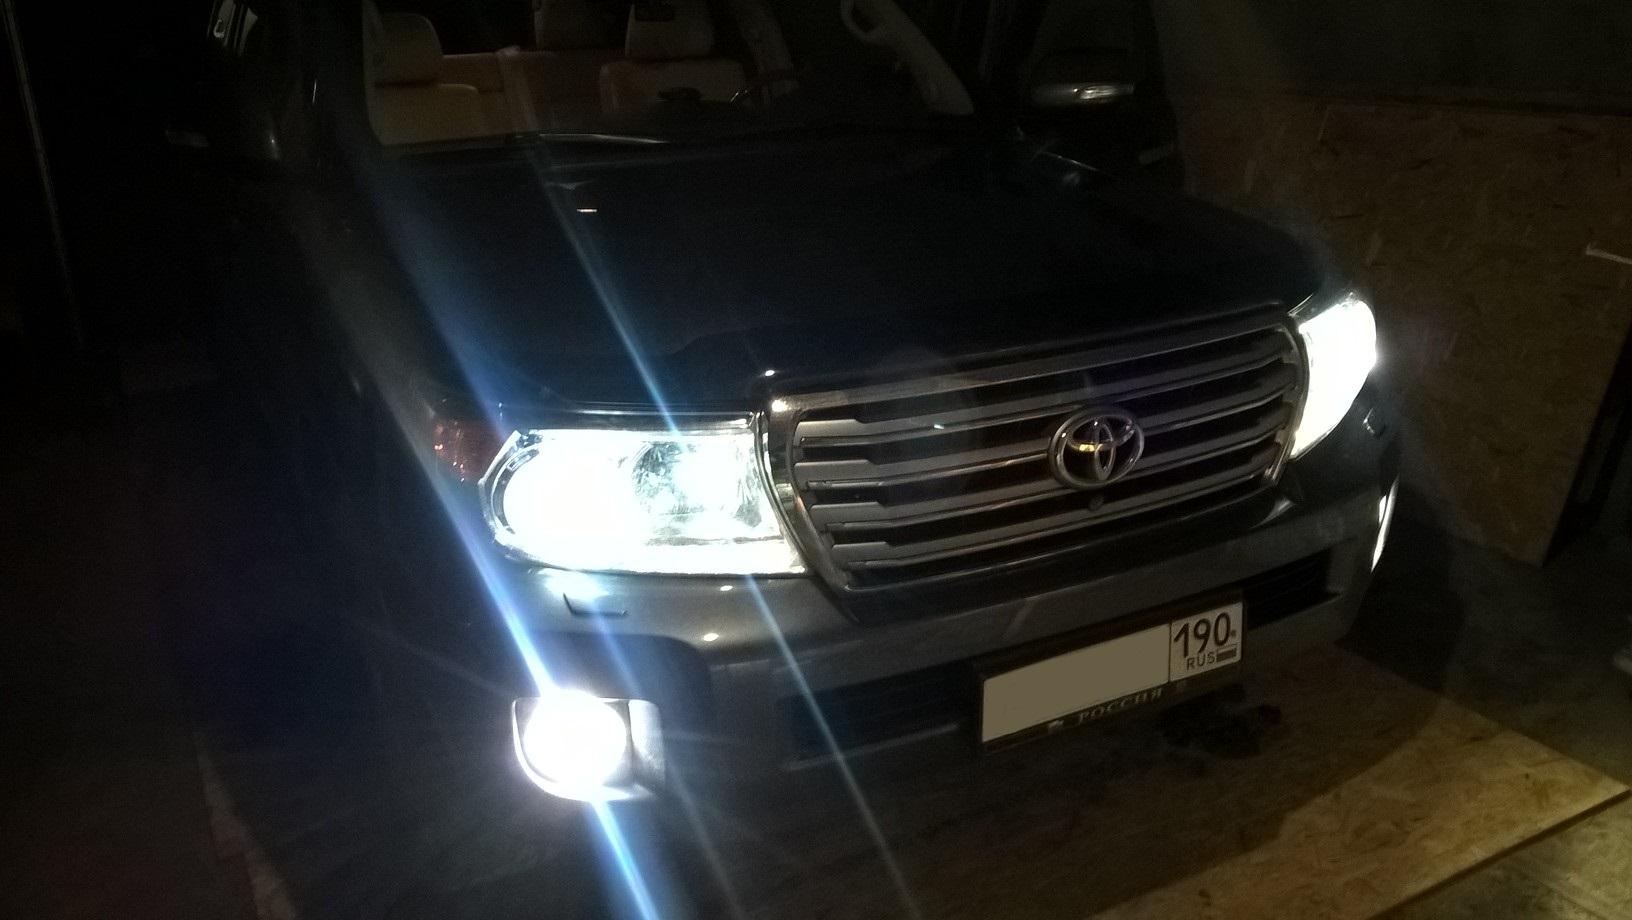 Чип тюнинг Тойота Ленд Крузер 200 дизель